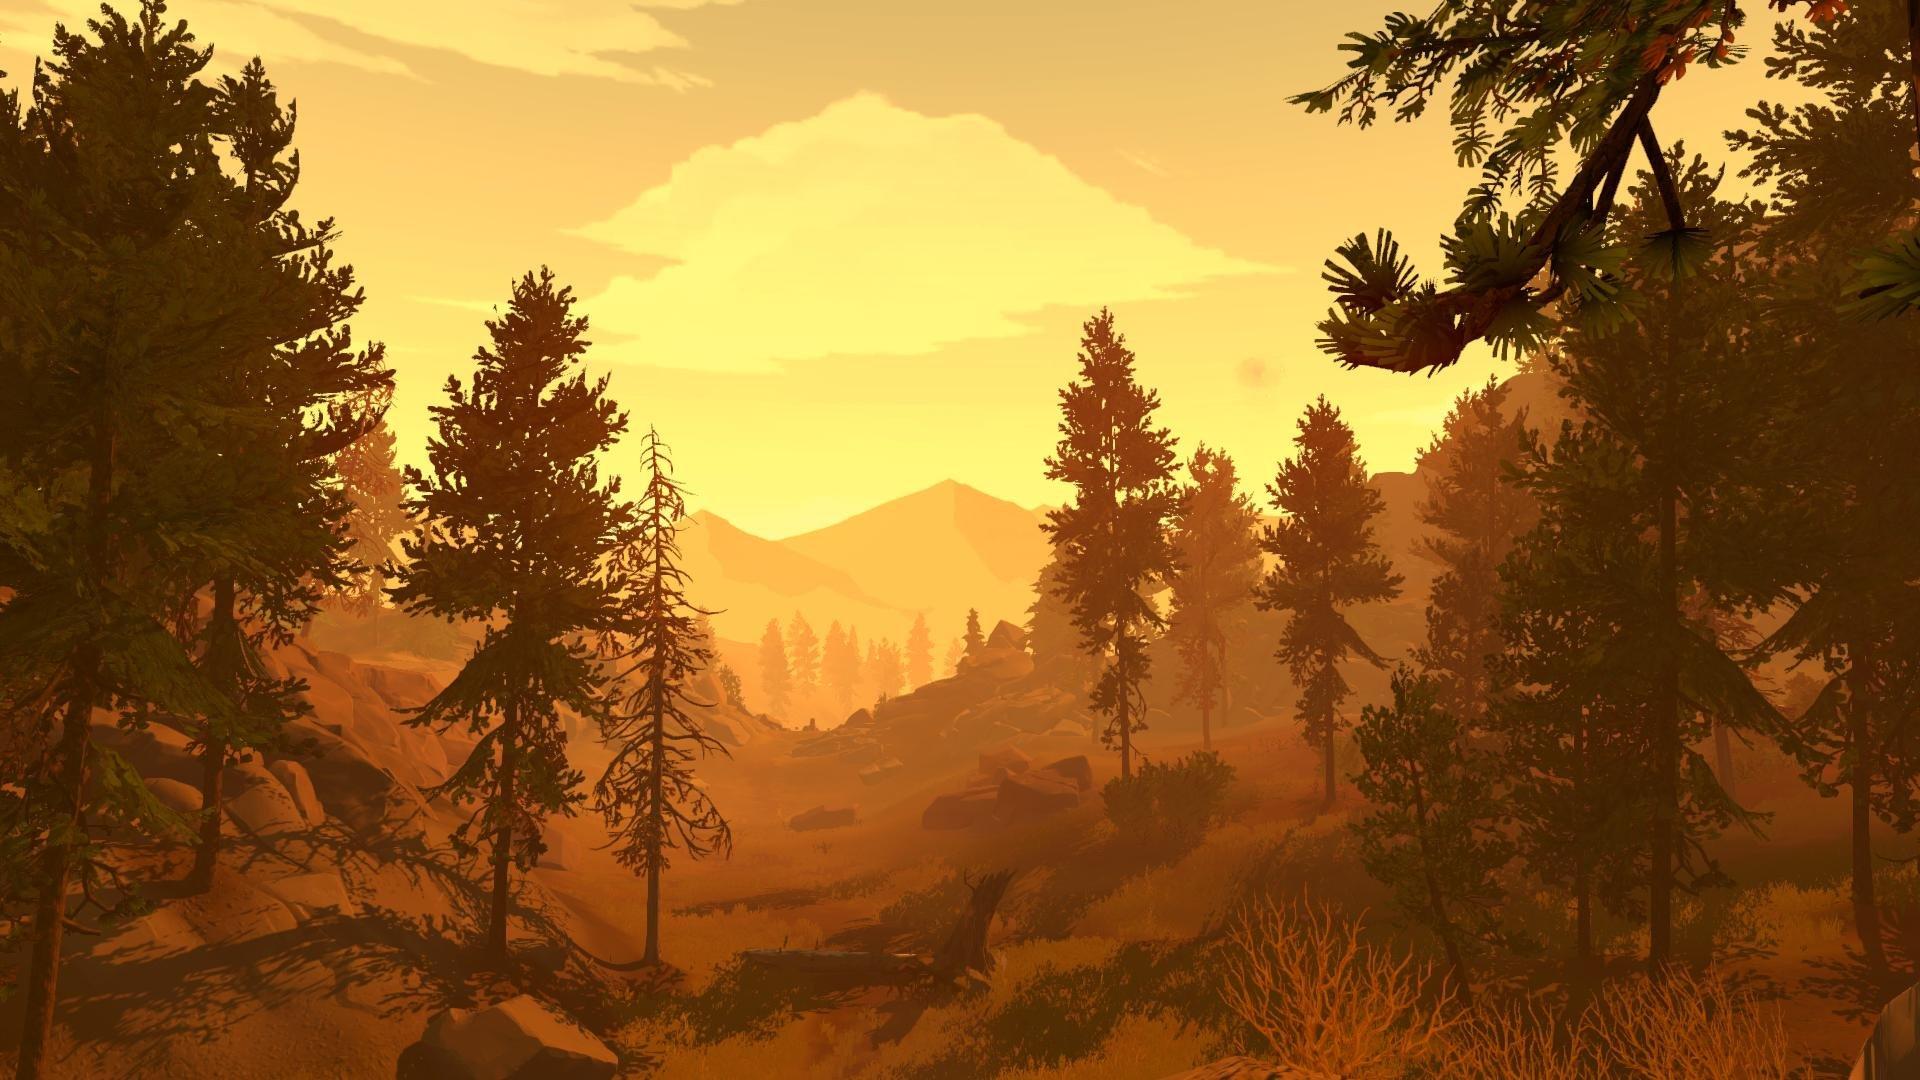 firewatch wallpaper,nature,natural landscape,sky,tree,atmospheric phenomenon